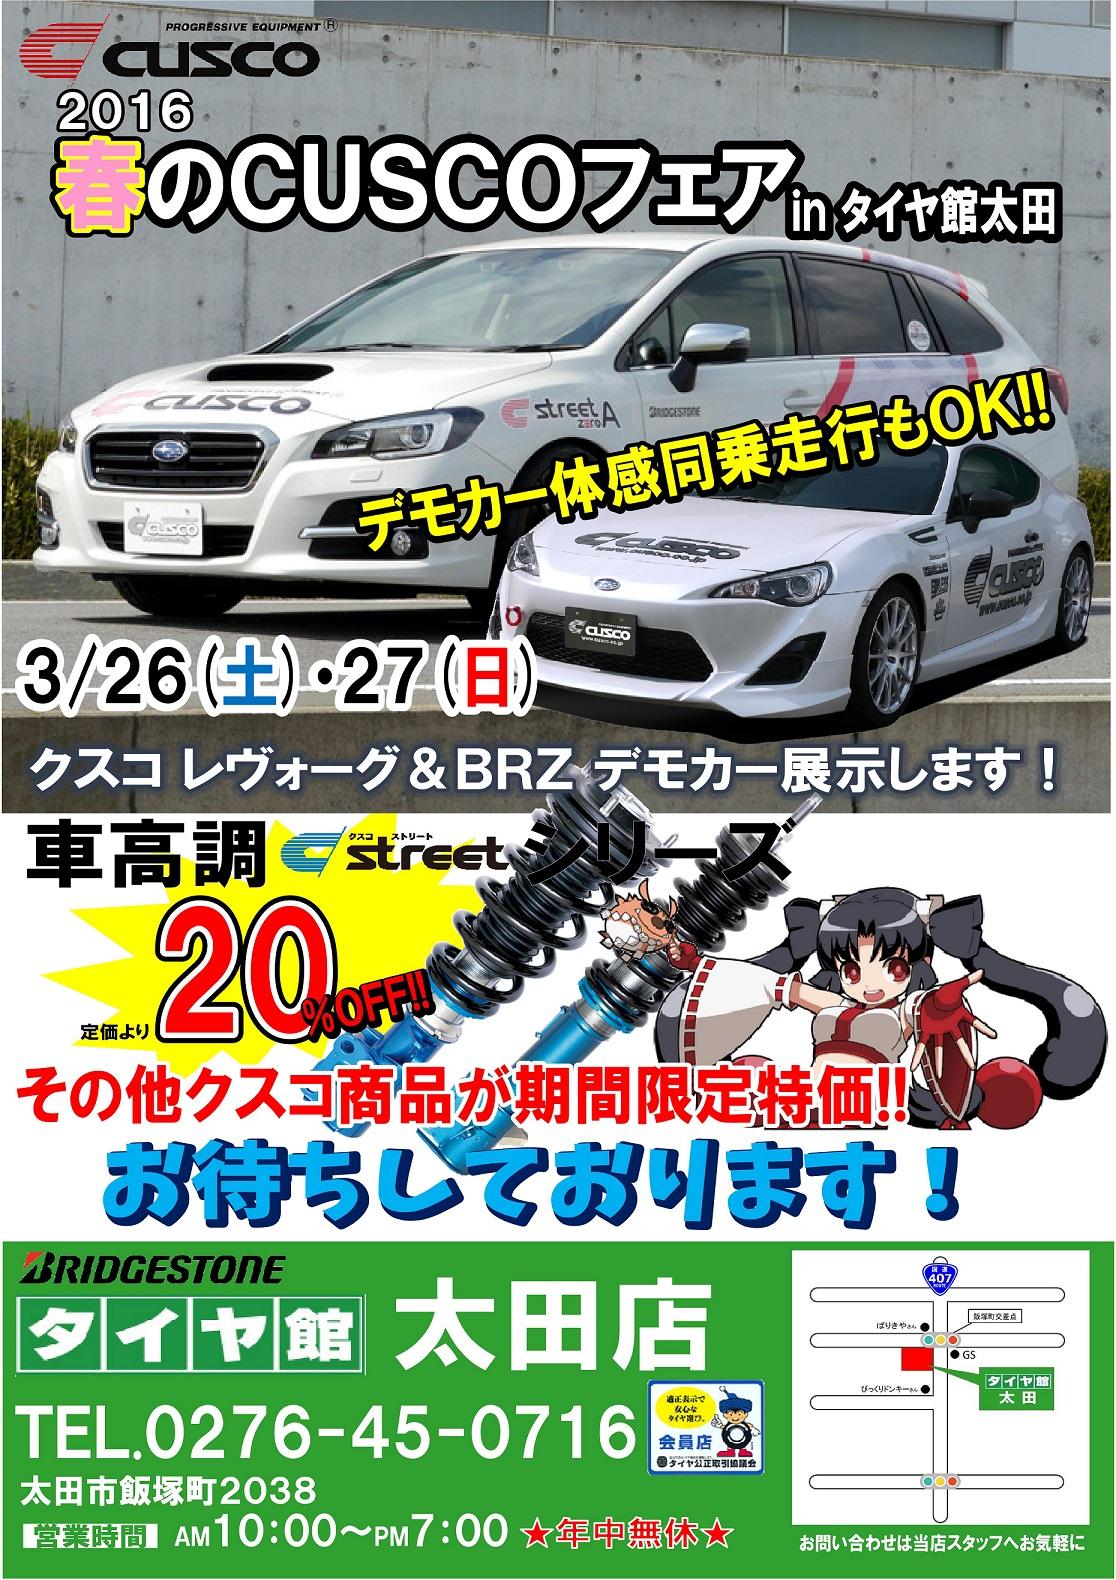 TK太田クスコデモカー案内[1]